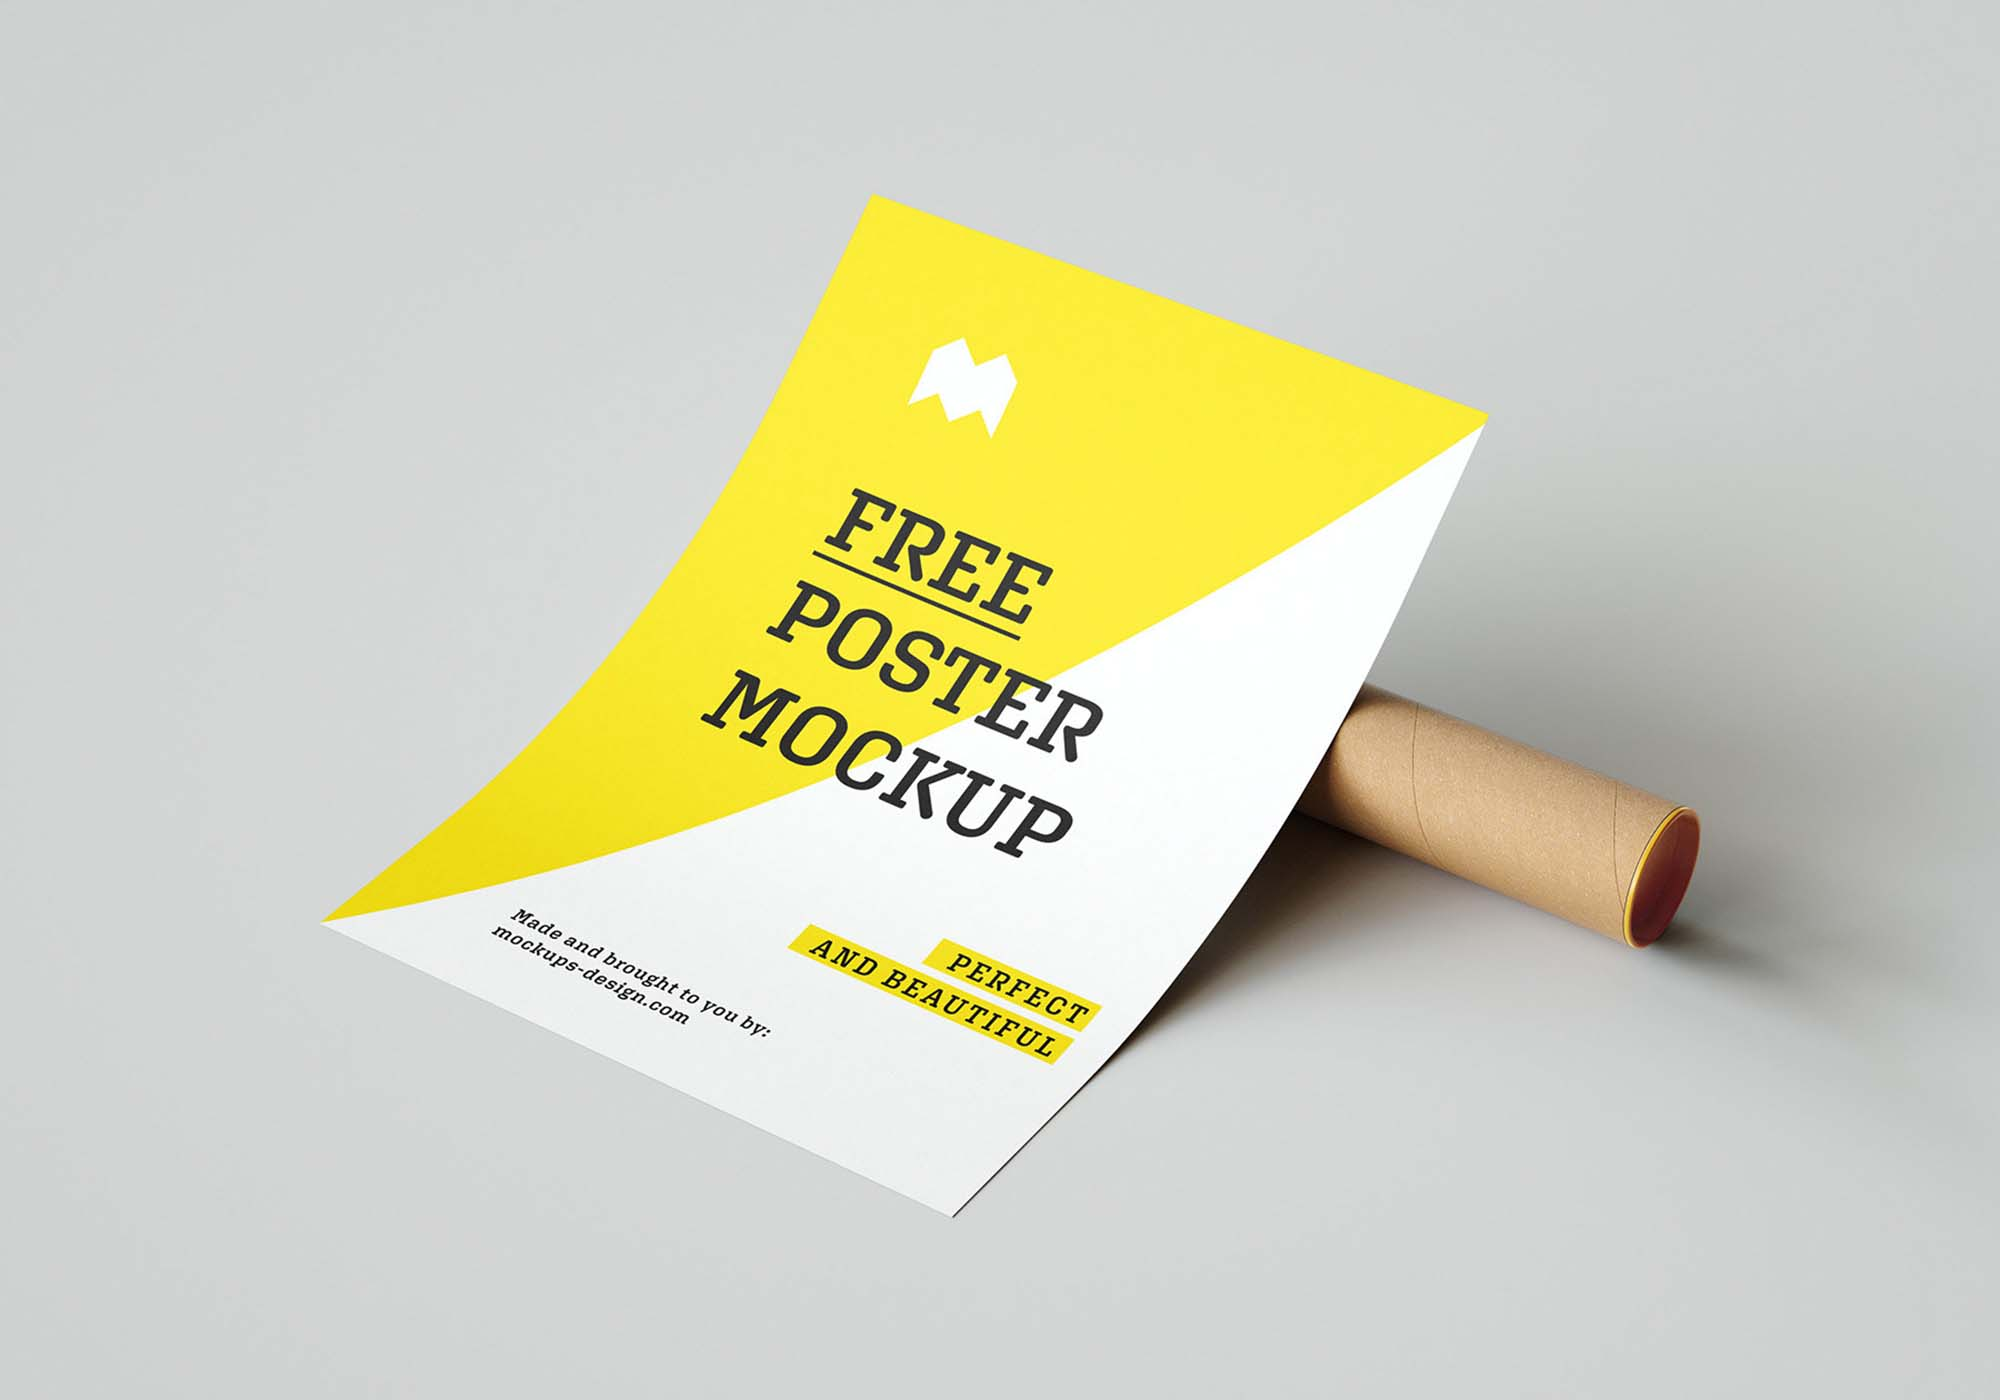 Paper Poster Mockup 2